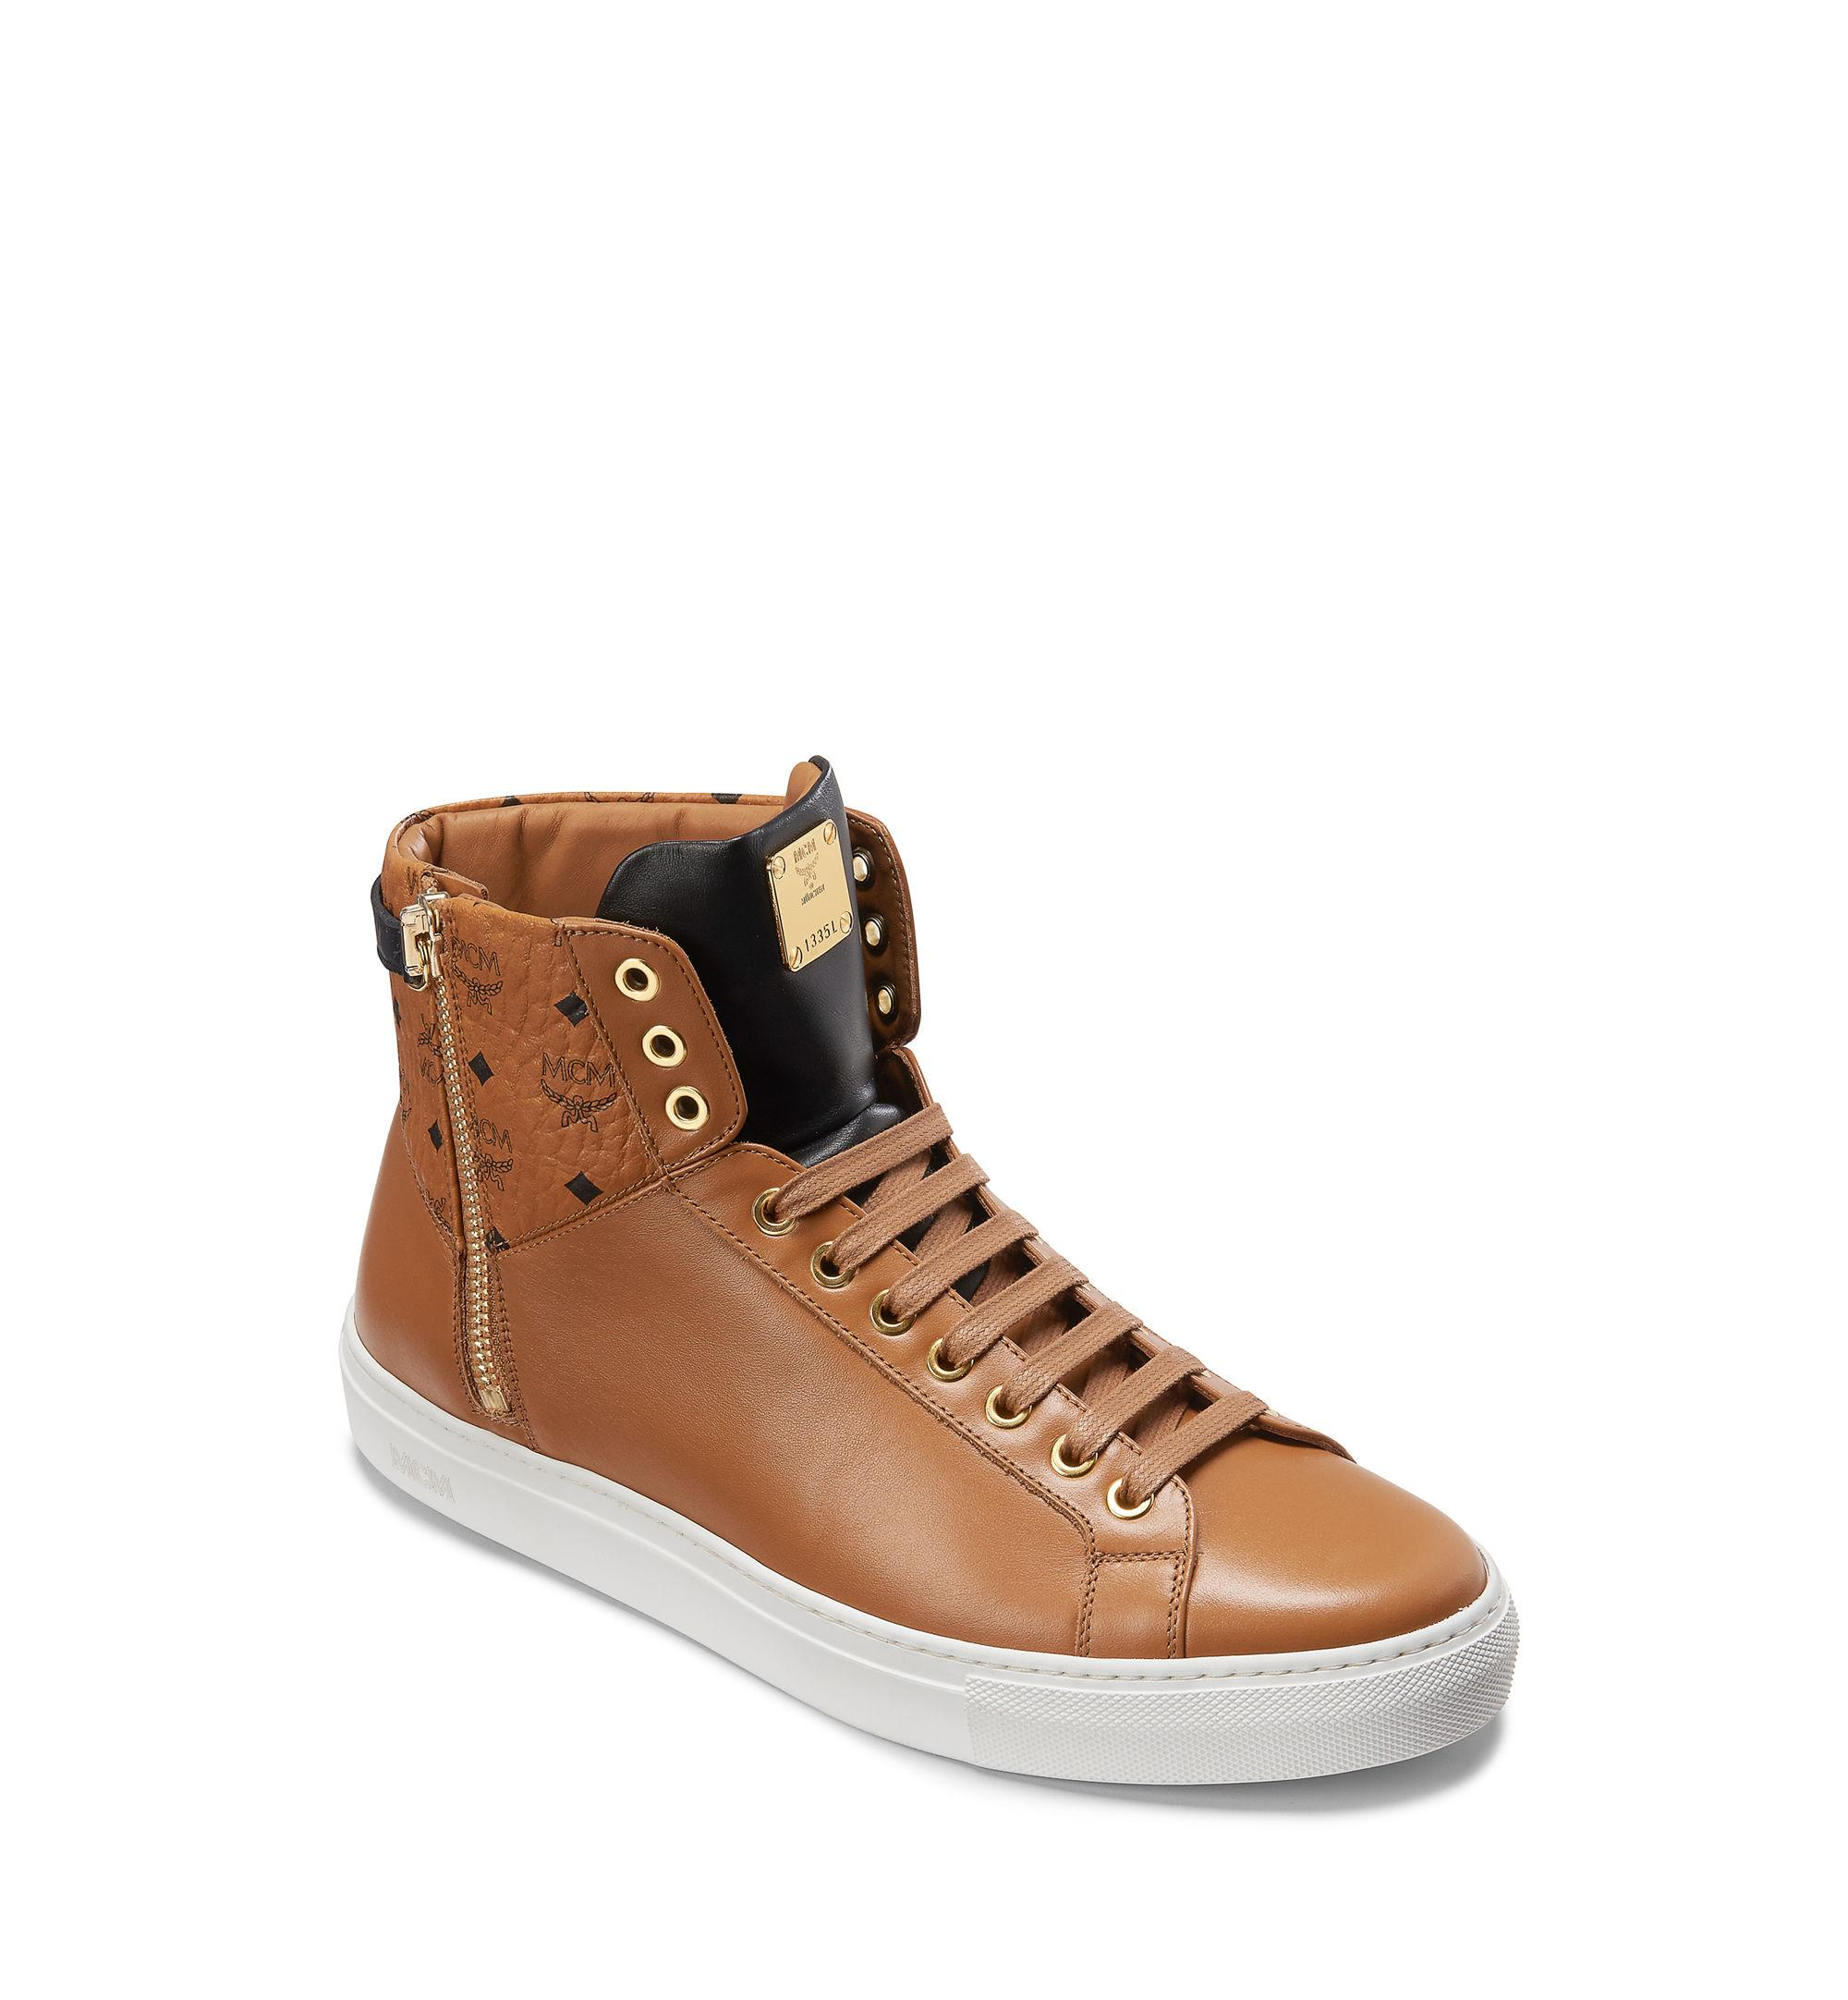 Mcm Slip On Shoes